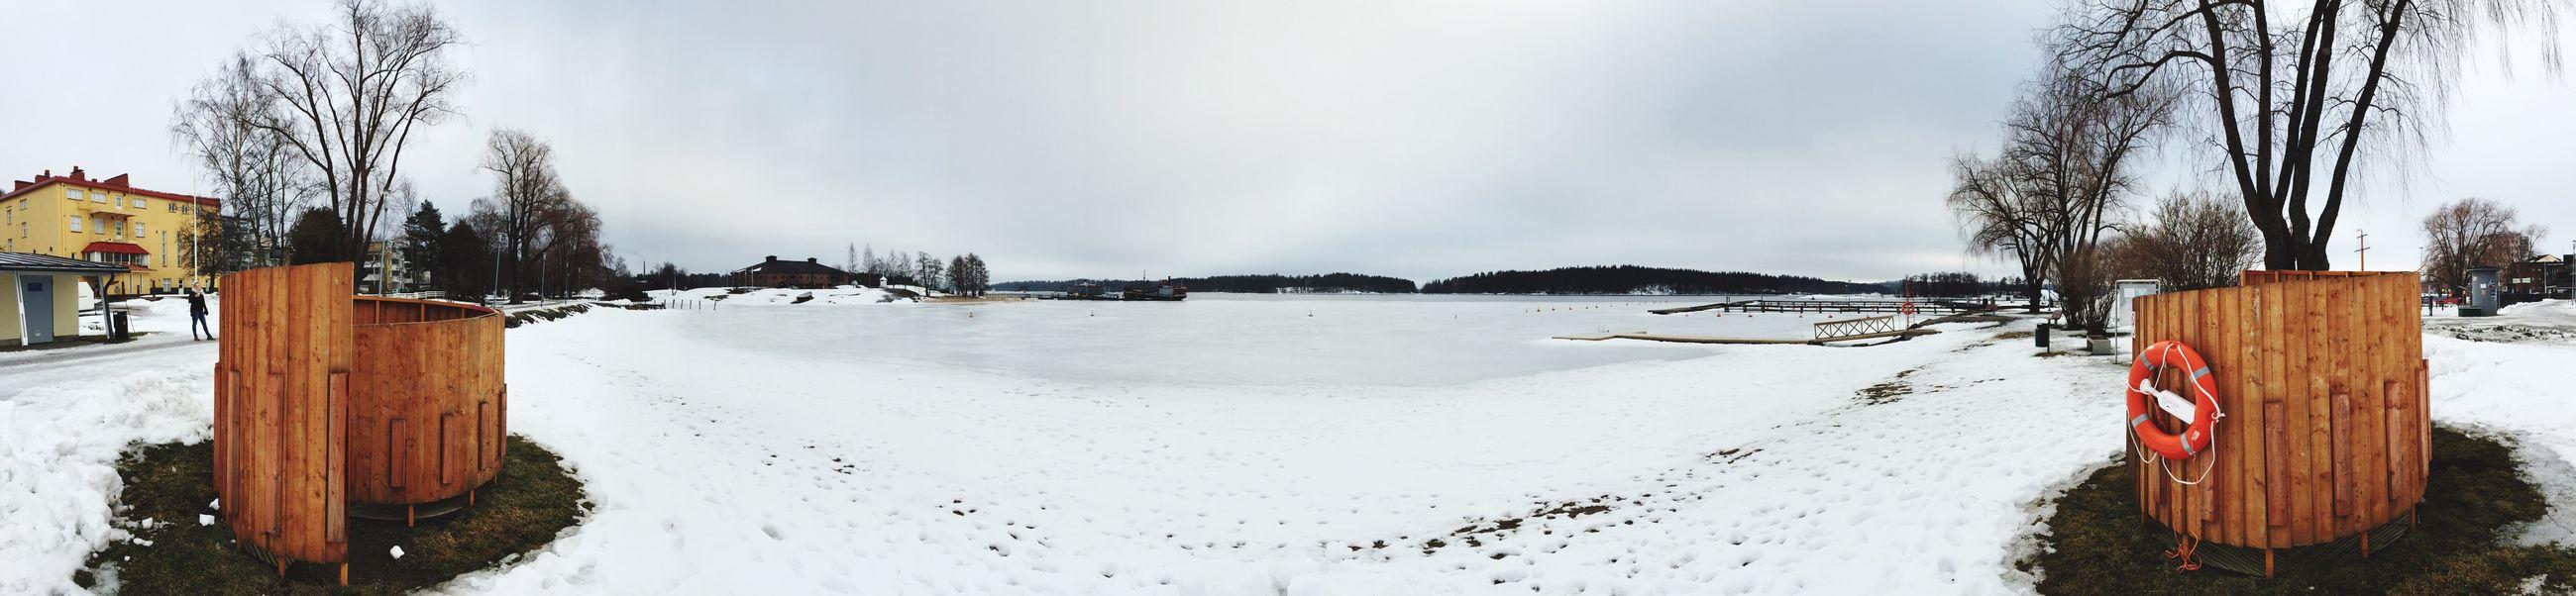 360° Finland Snow ❄